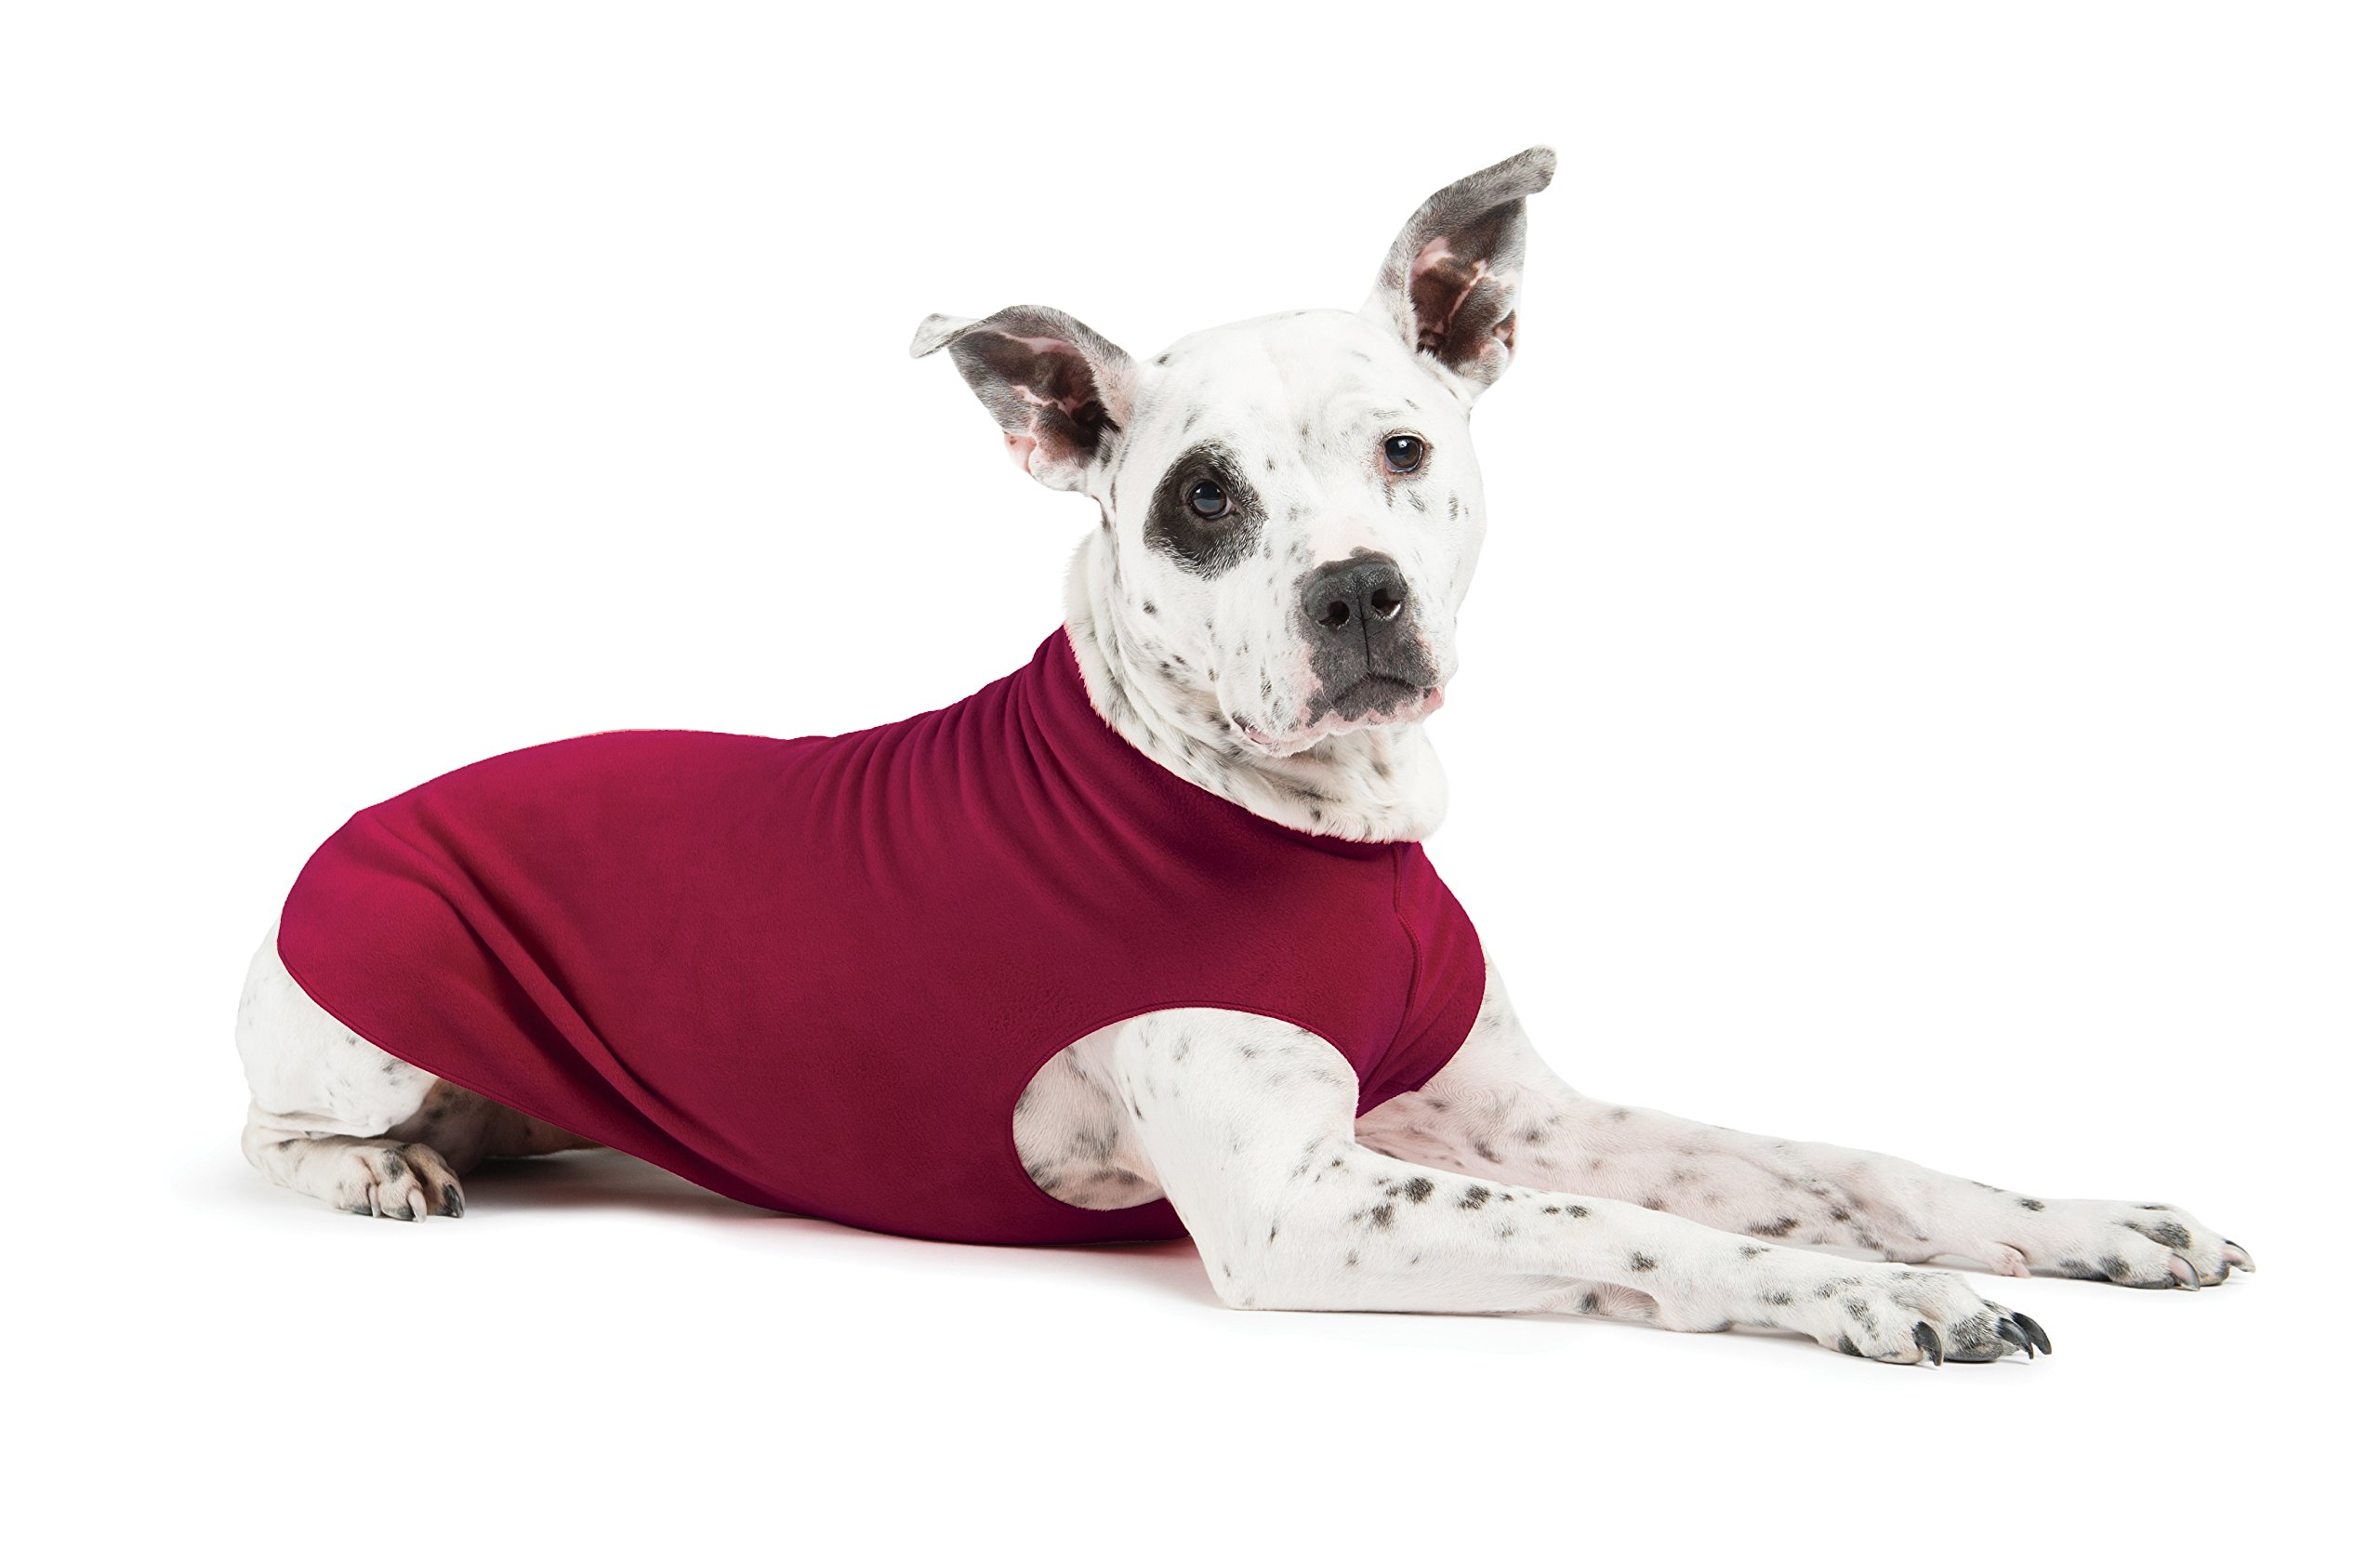 Gold Paw Stretch Fleece Dog Coat – Soft, Warm Dog Clothes, Stretchy Pet Sweater – Machine Washable, Eco Friendly – All Season, Garnet, Size 4